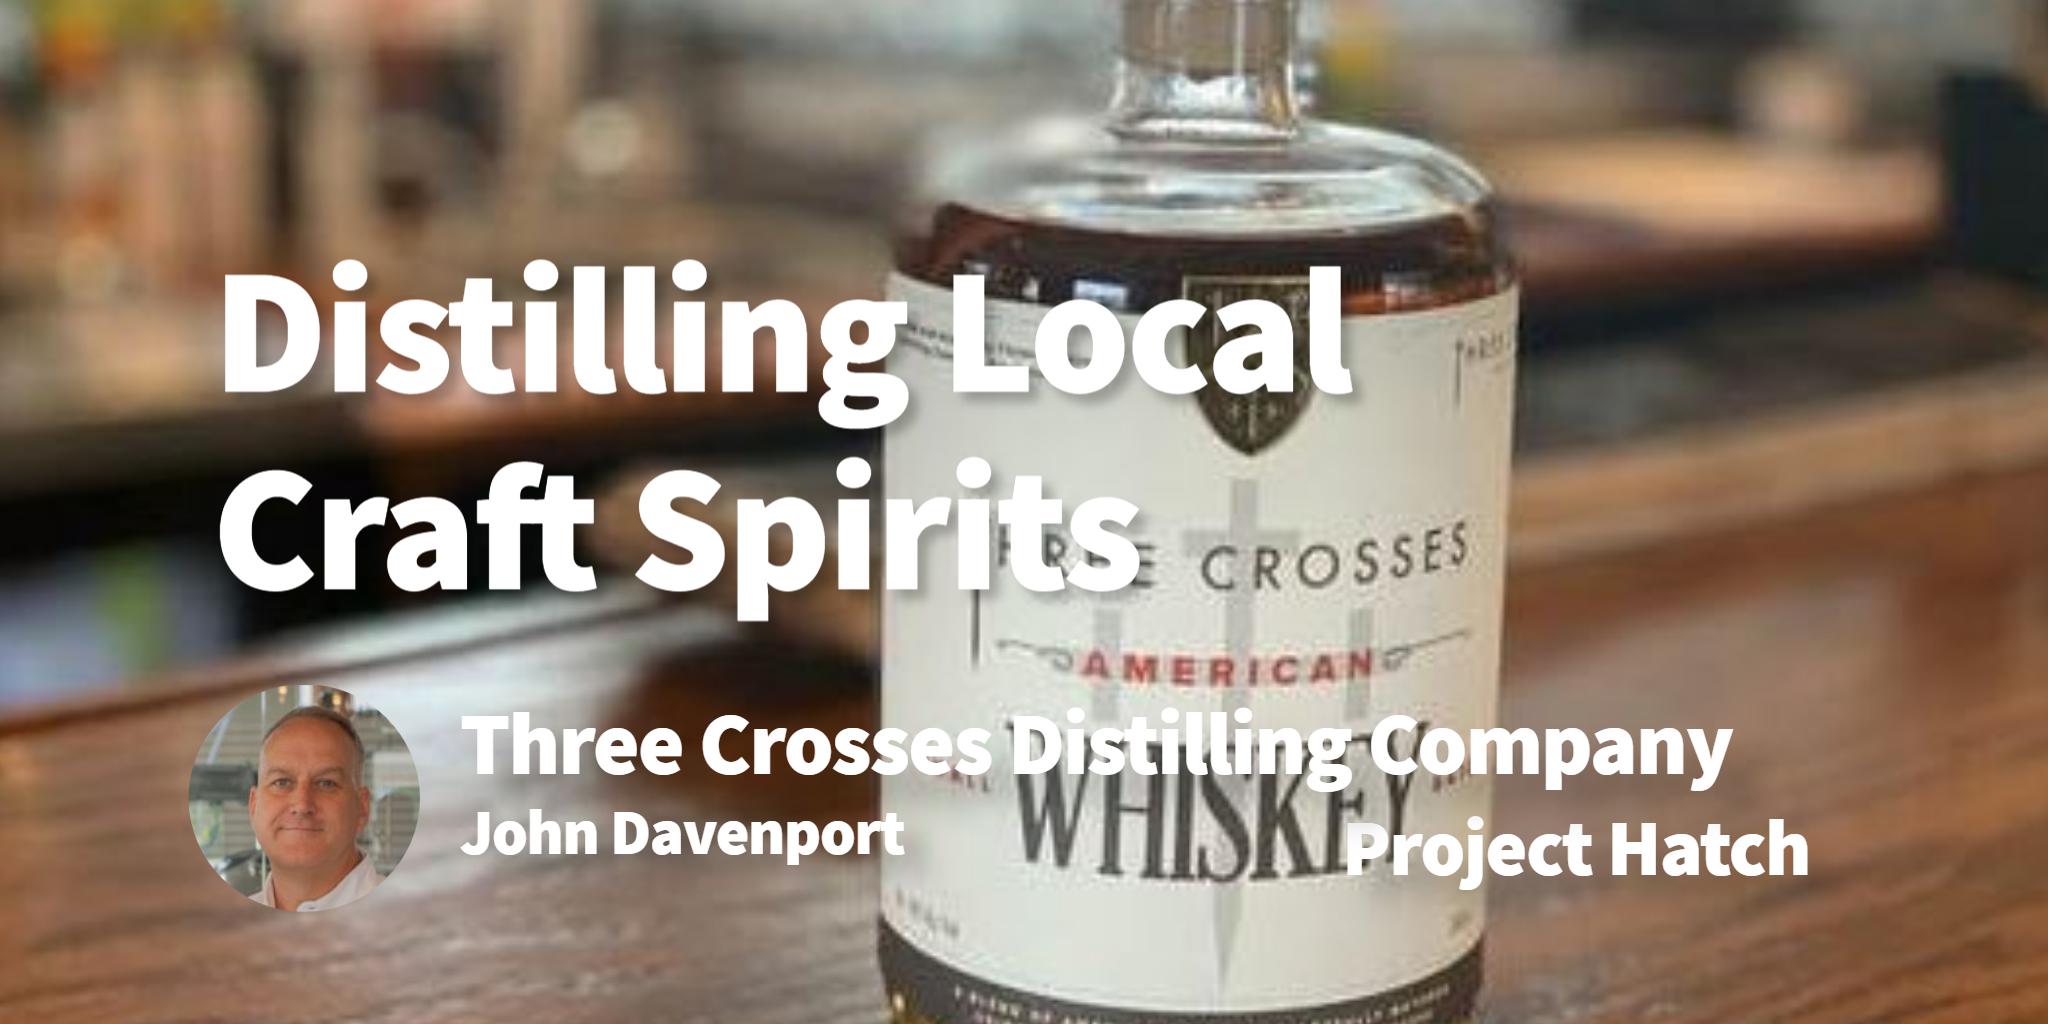 Three Crosses Distilling Company John Davenport